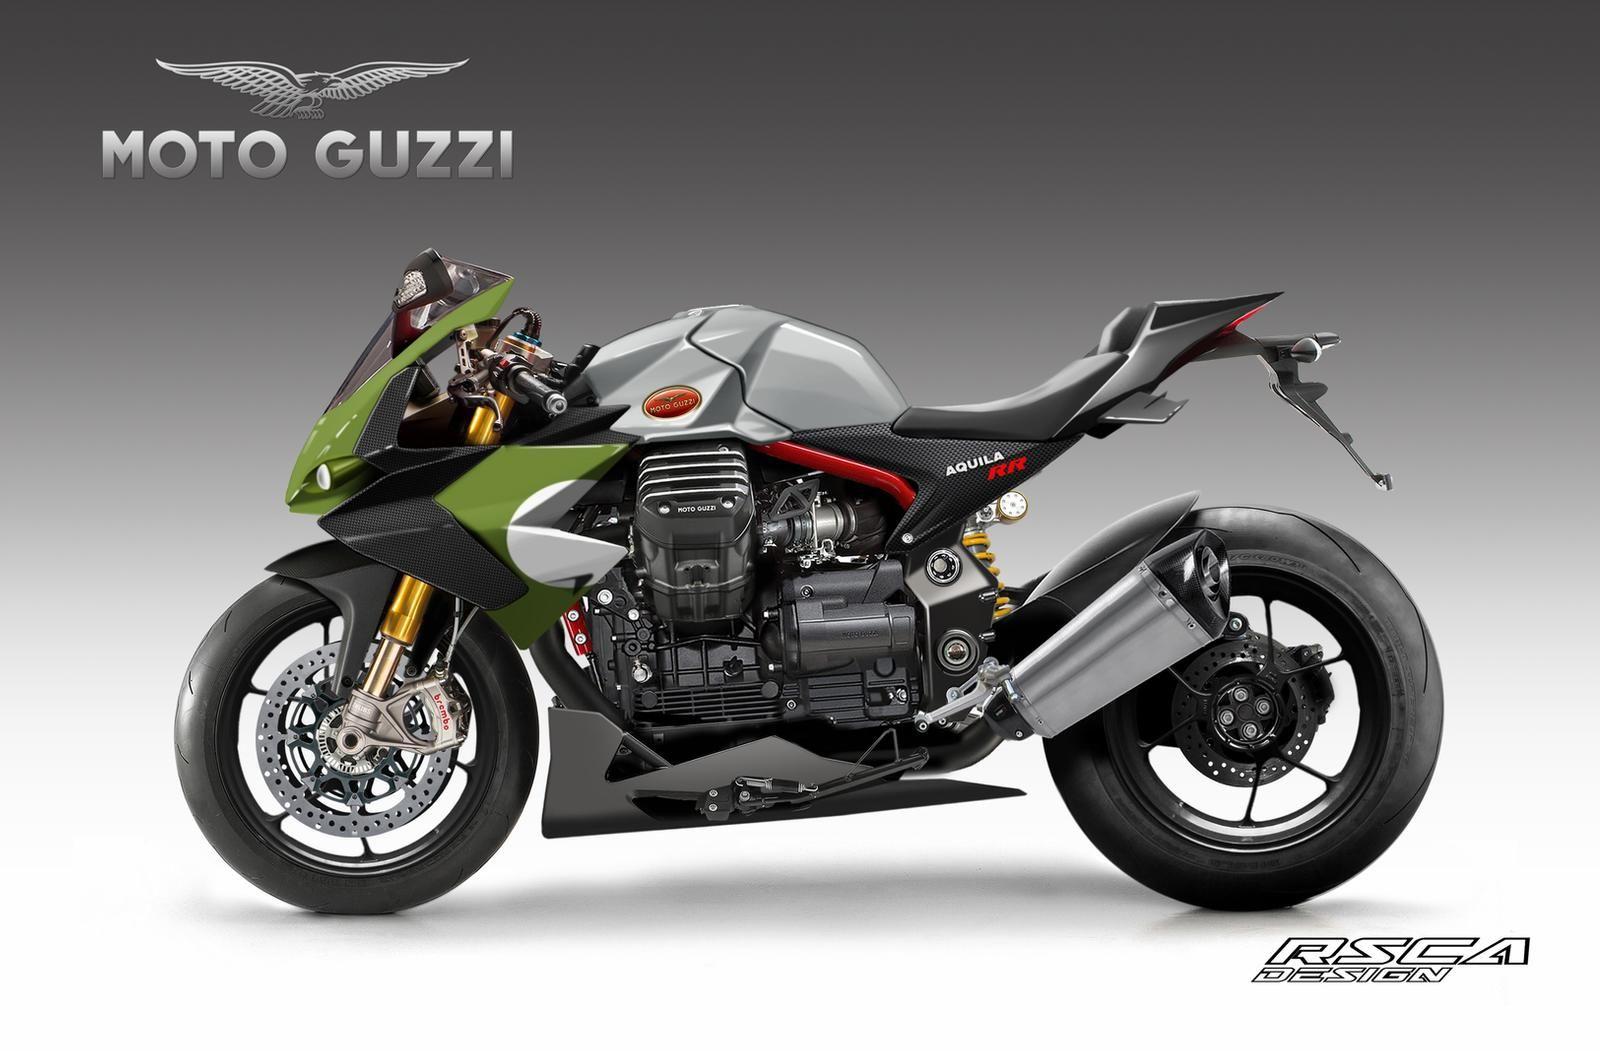 Moto Guzzi Aquila Rr Liquid Cooled 1300 Cc 160 Cv By Rsca3215 On Deviantart Moto Guzzi Motorcycles Moto Guzzi Moto Guzzi V50